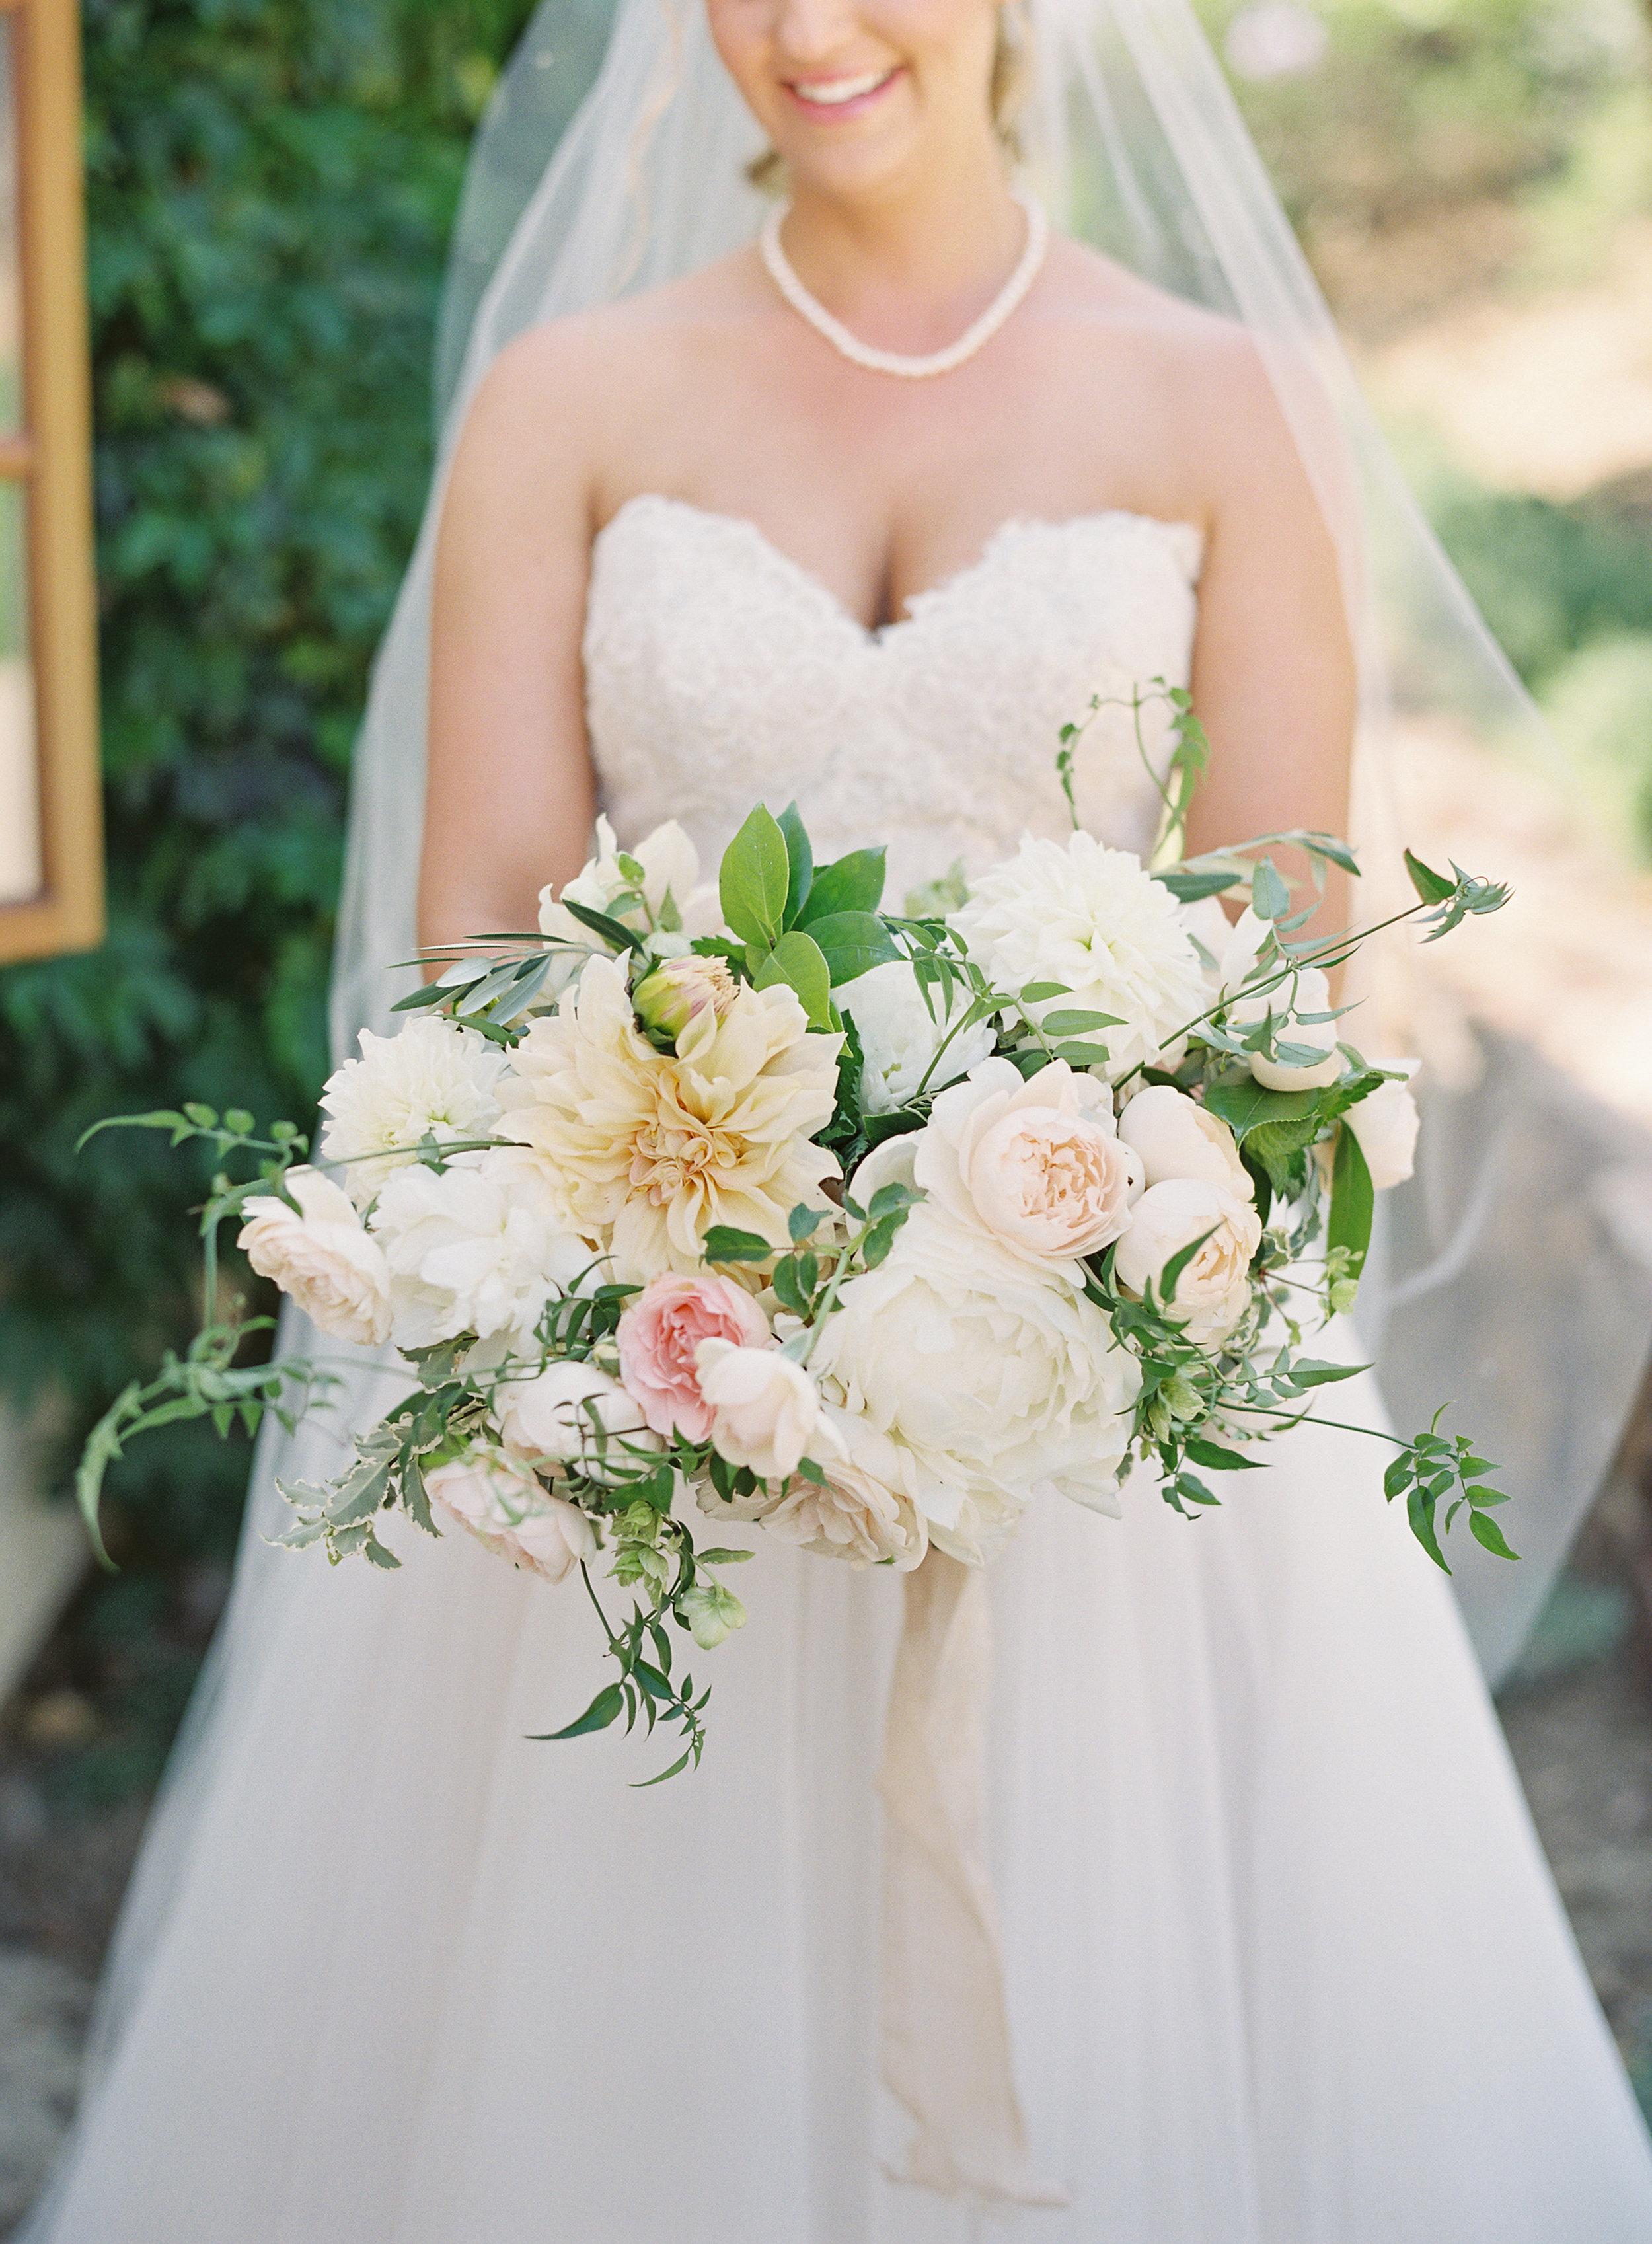 Braden-Hannah-Married-171.jpg